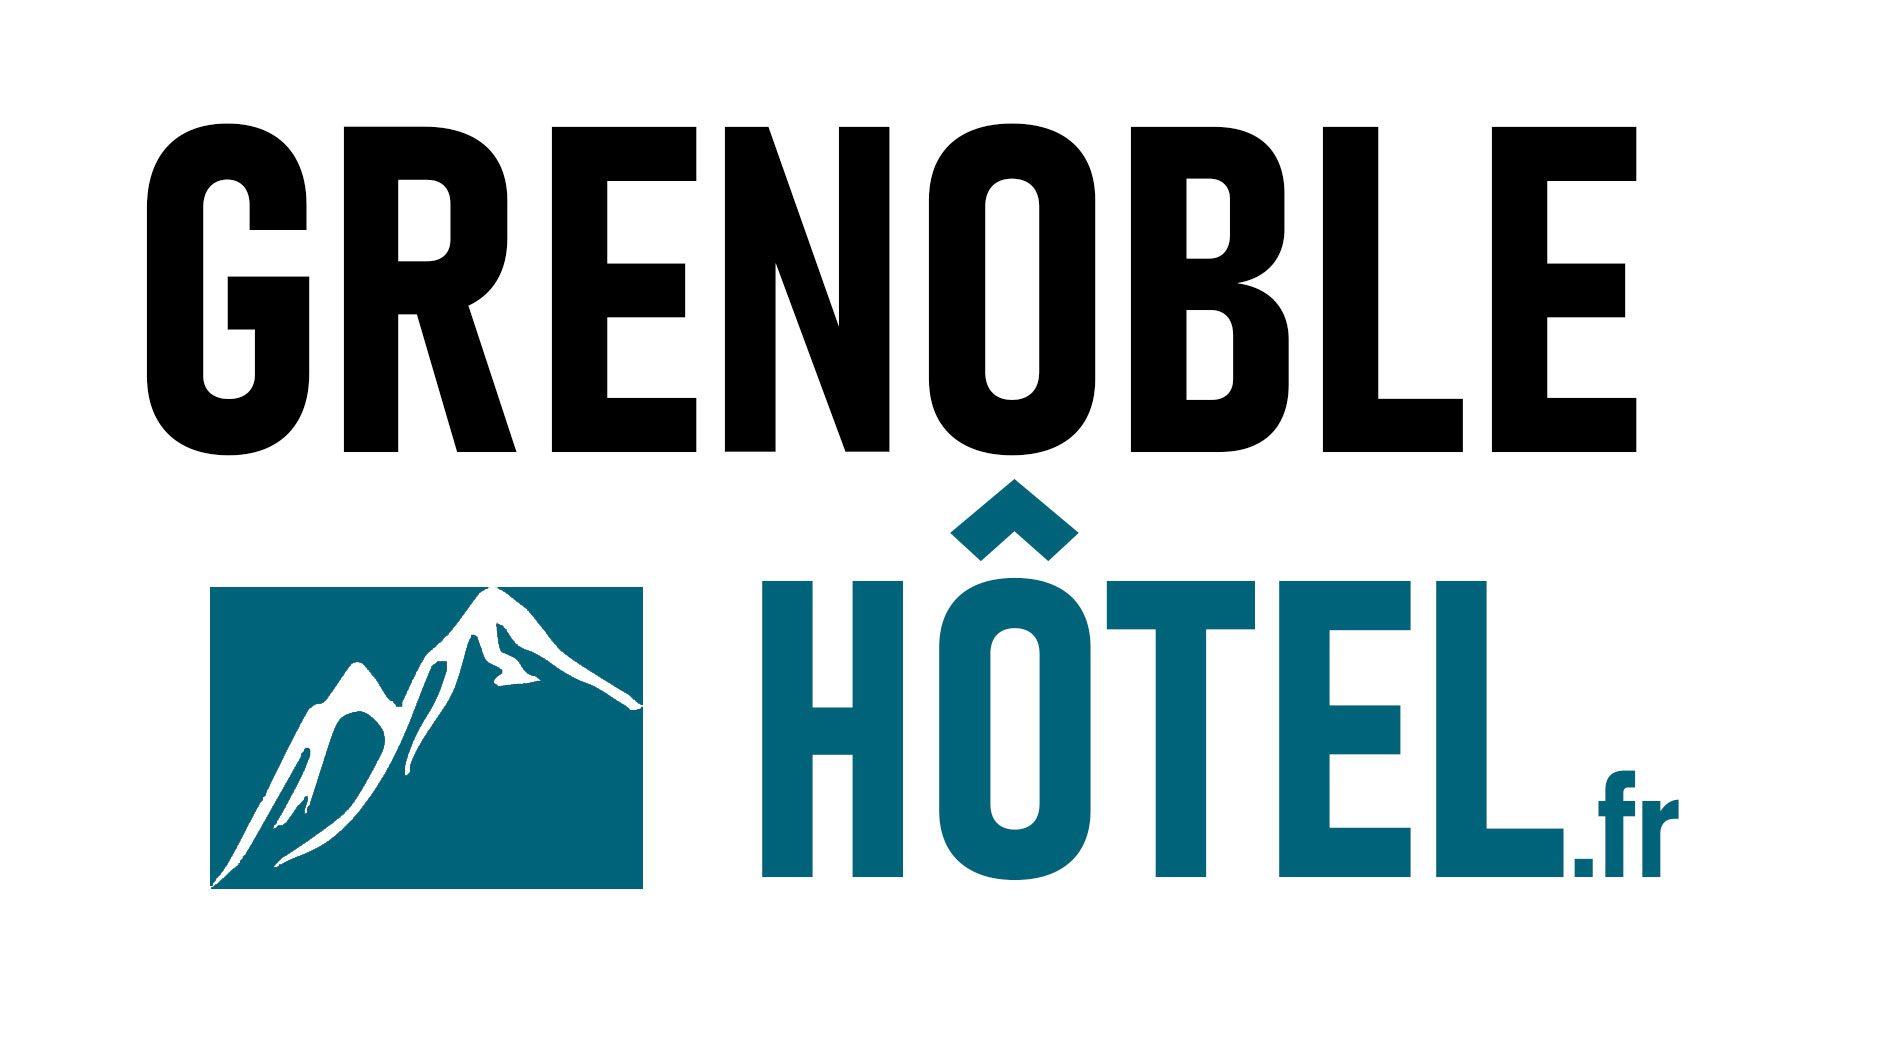 Grenoble Hôtel